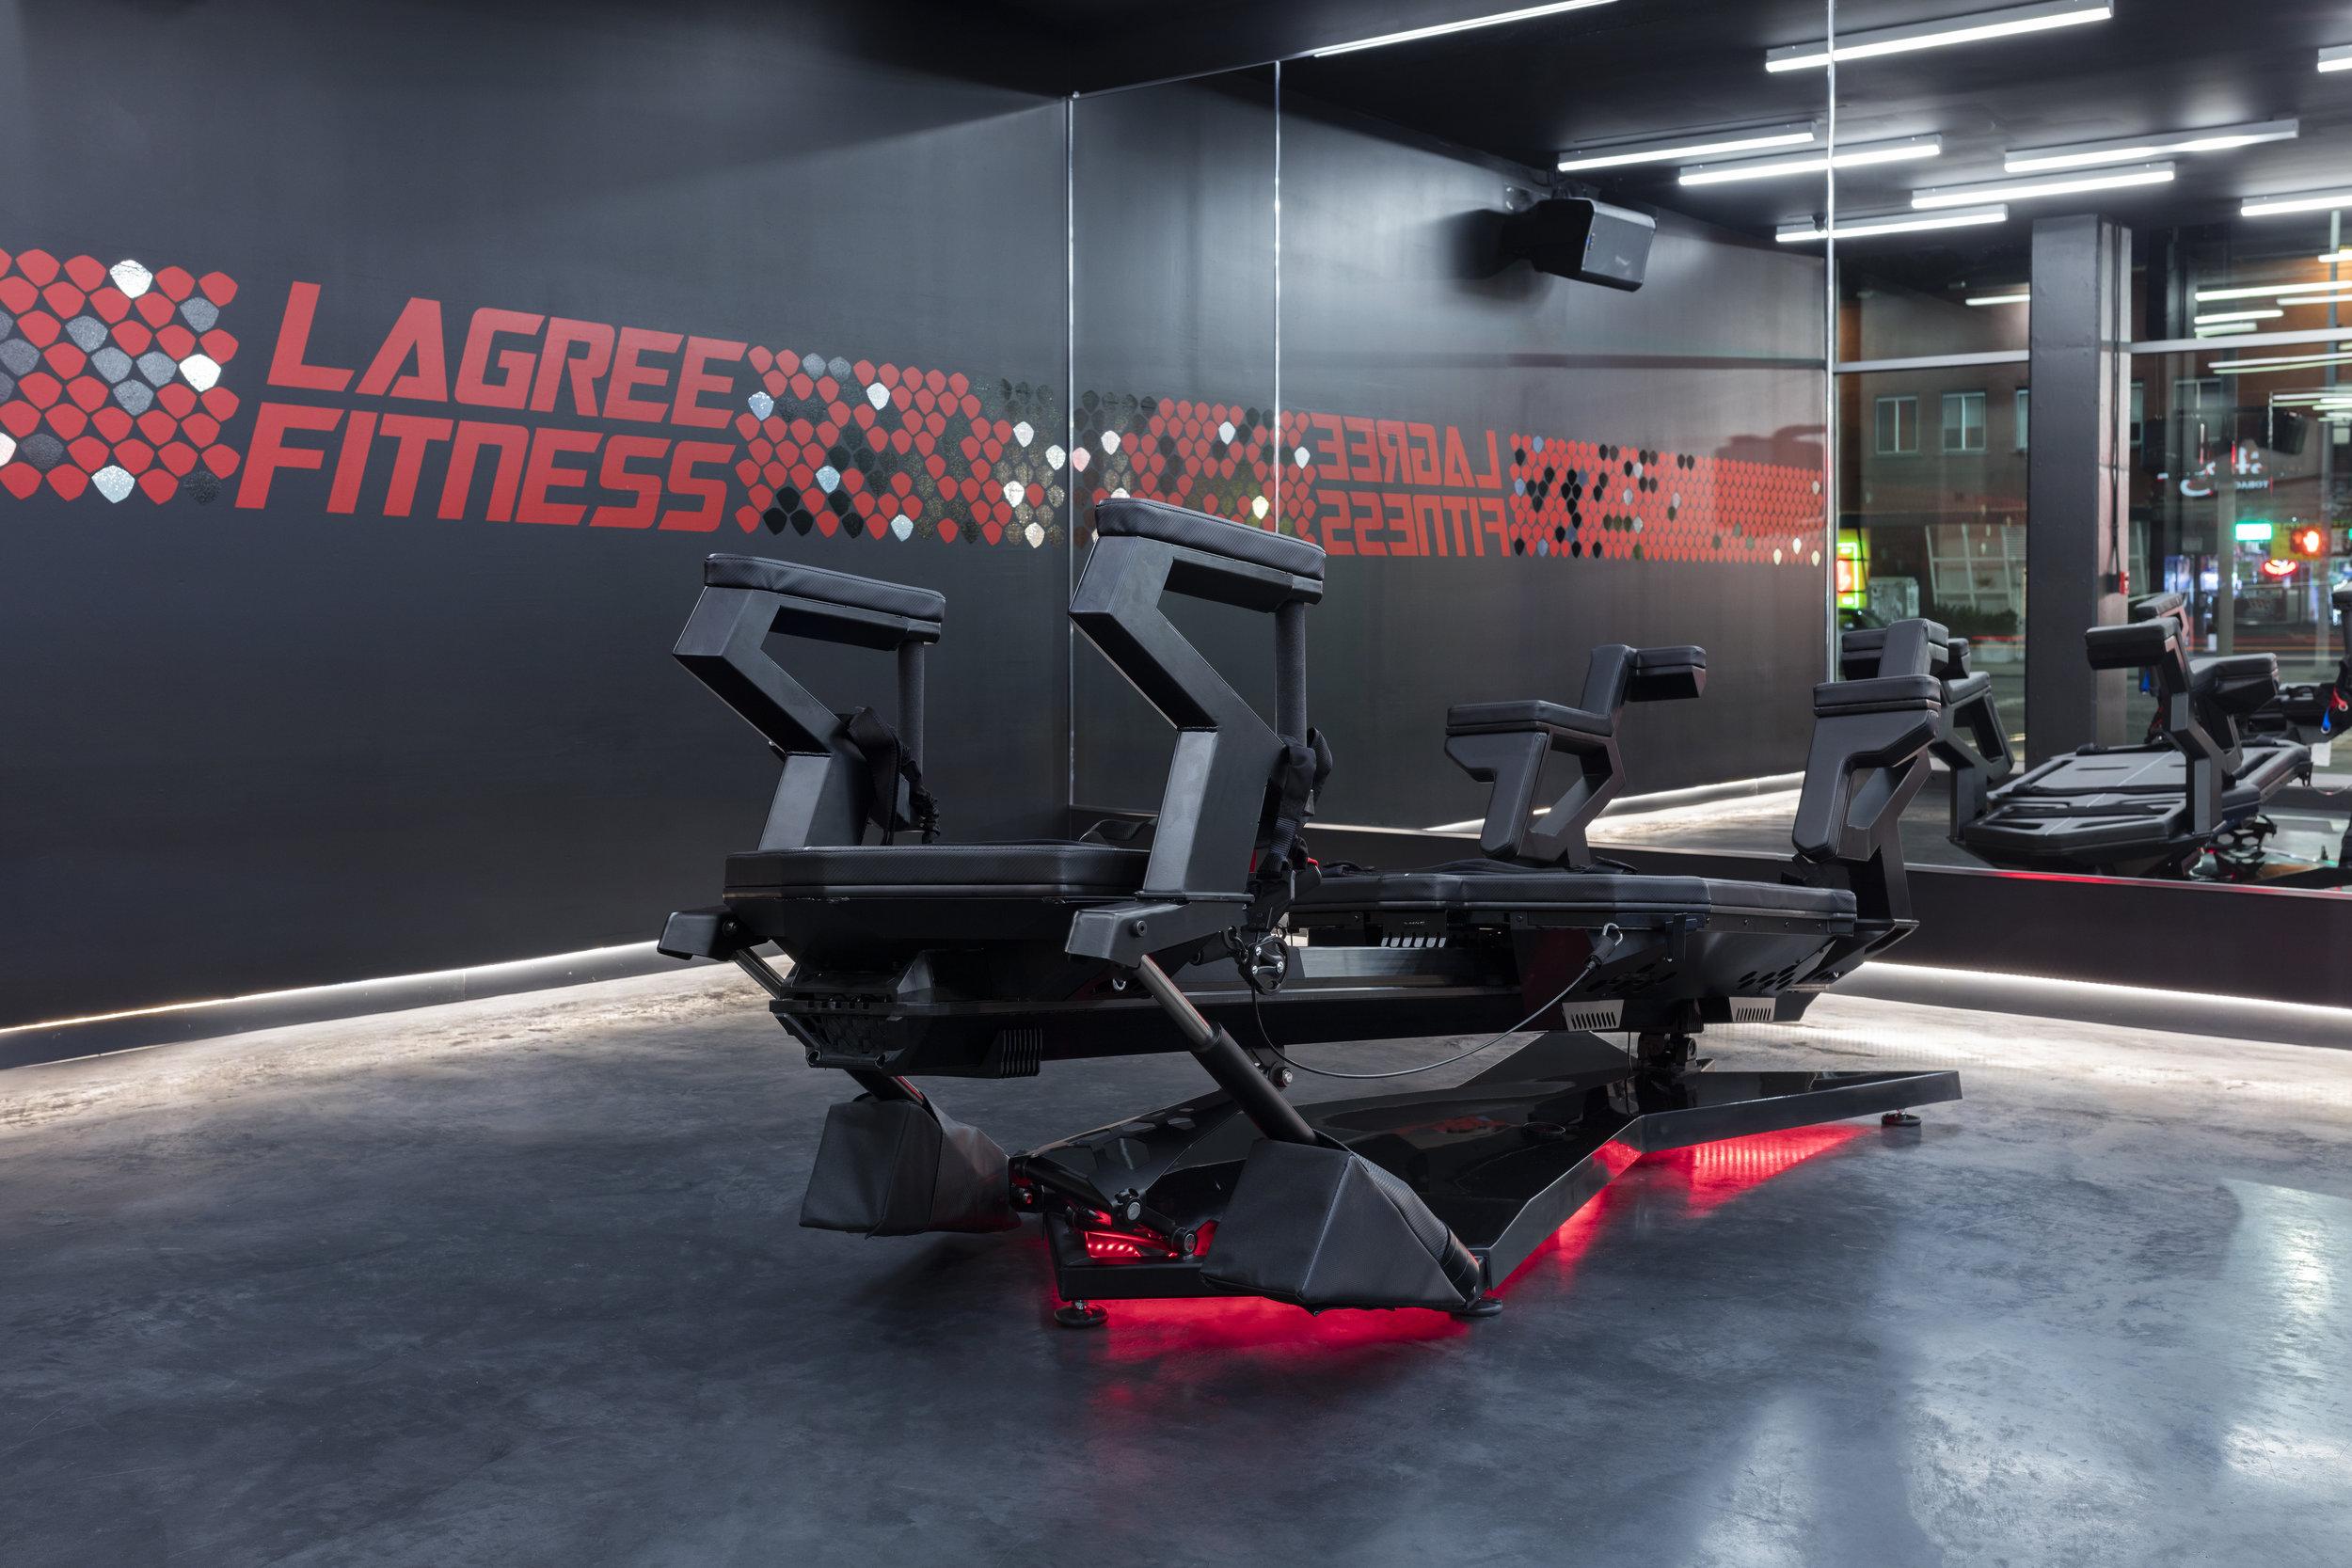 The Supraformer at Lagree Fitness Studio - The Gilded Bellini